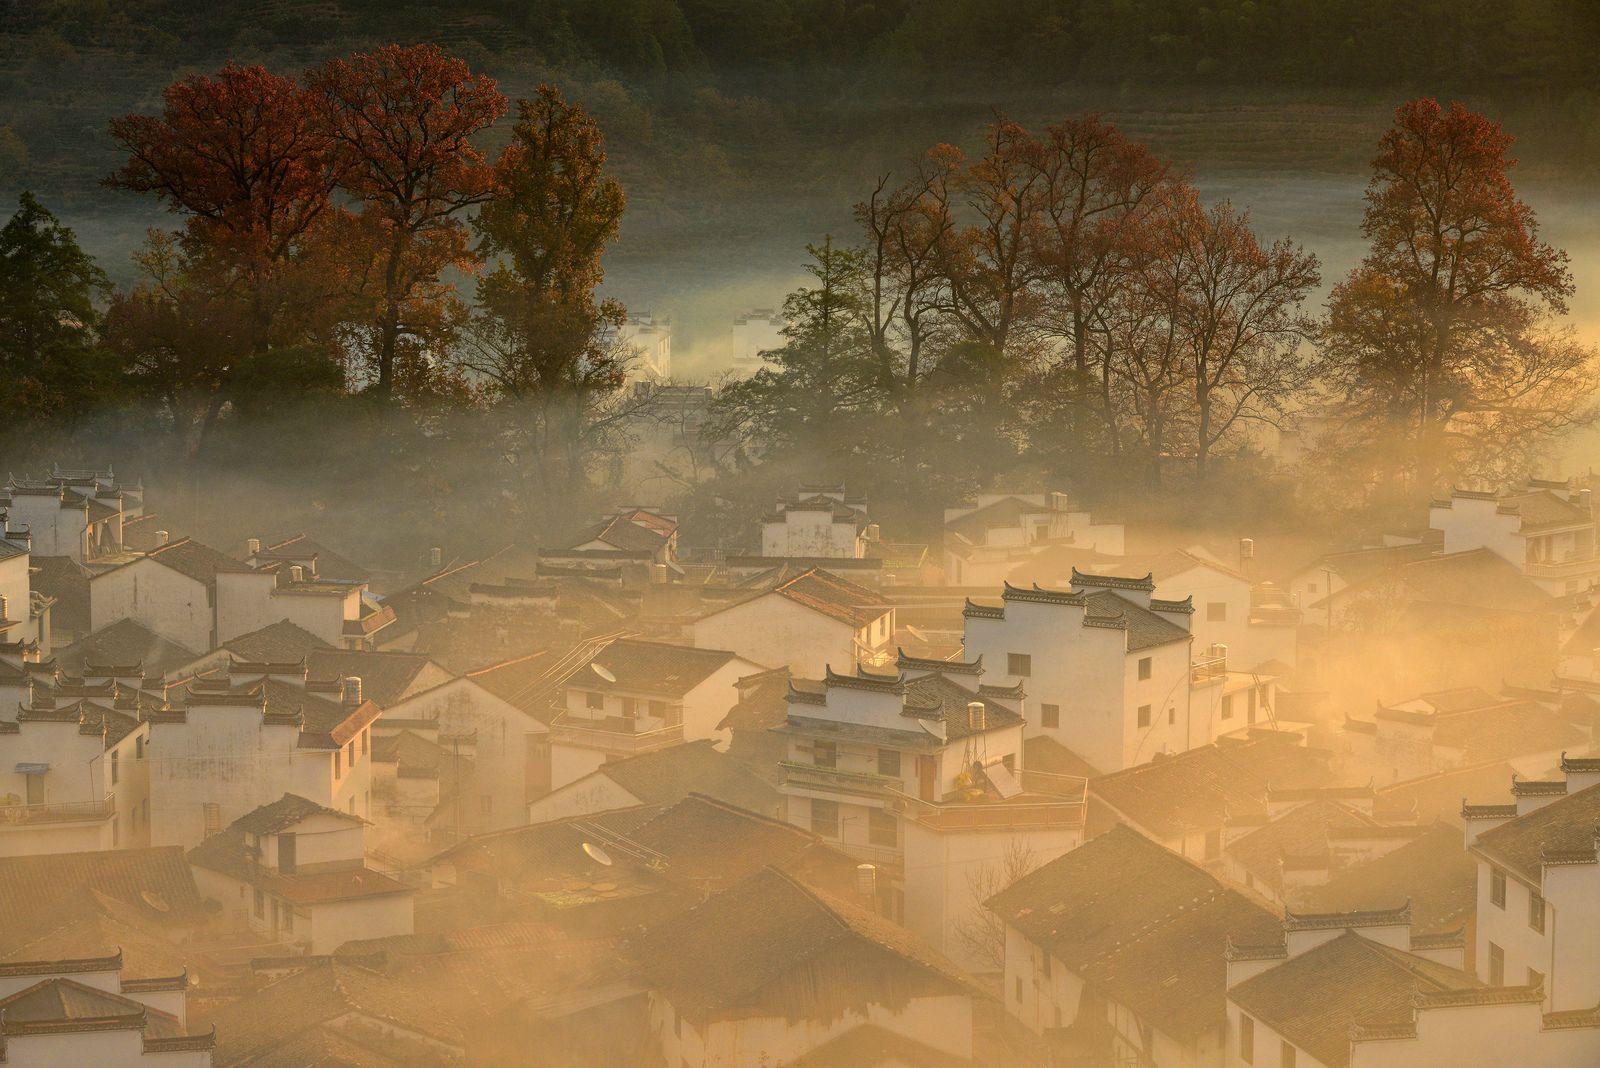 Wuyuan: China rural para un viaje alternativo